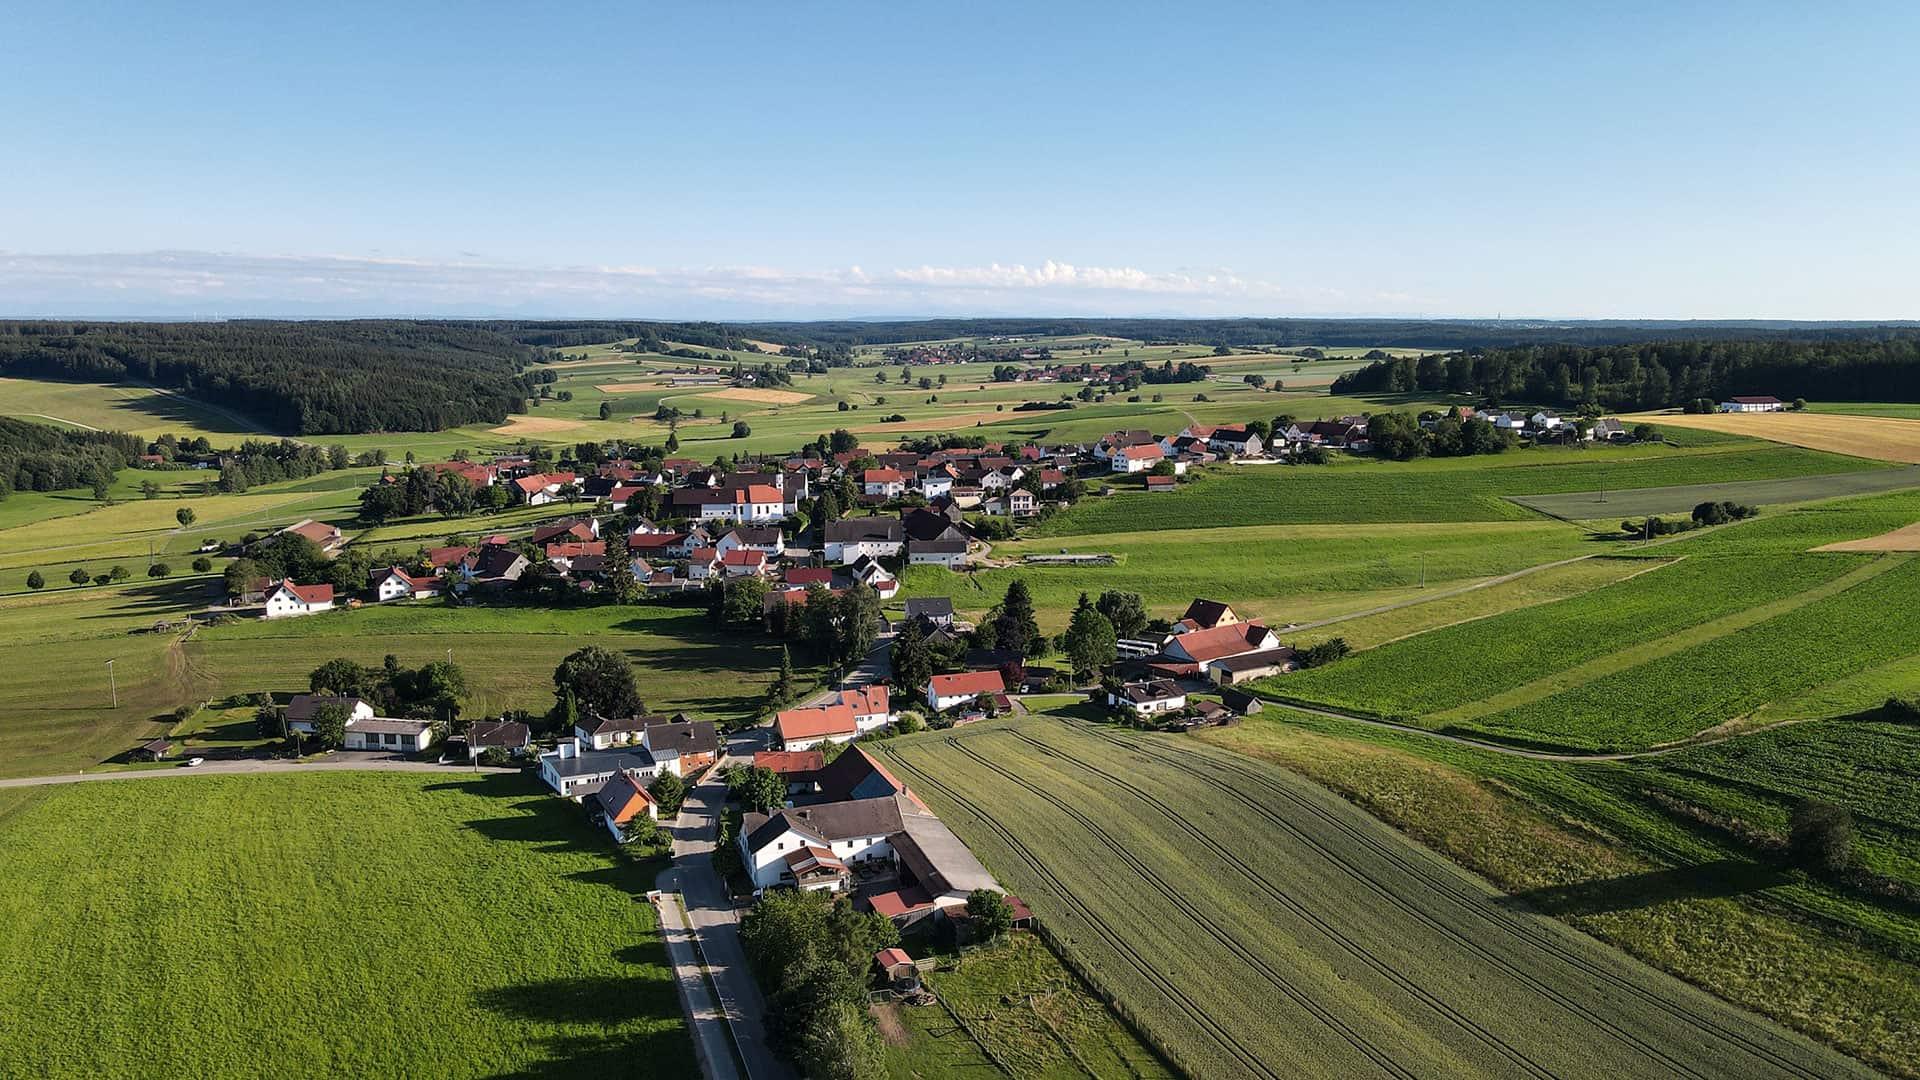 Konradshofen (Norden)